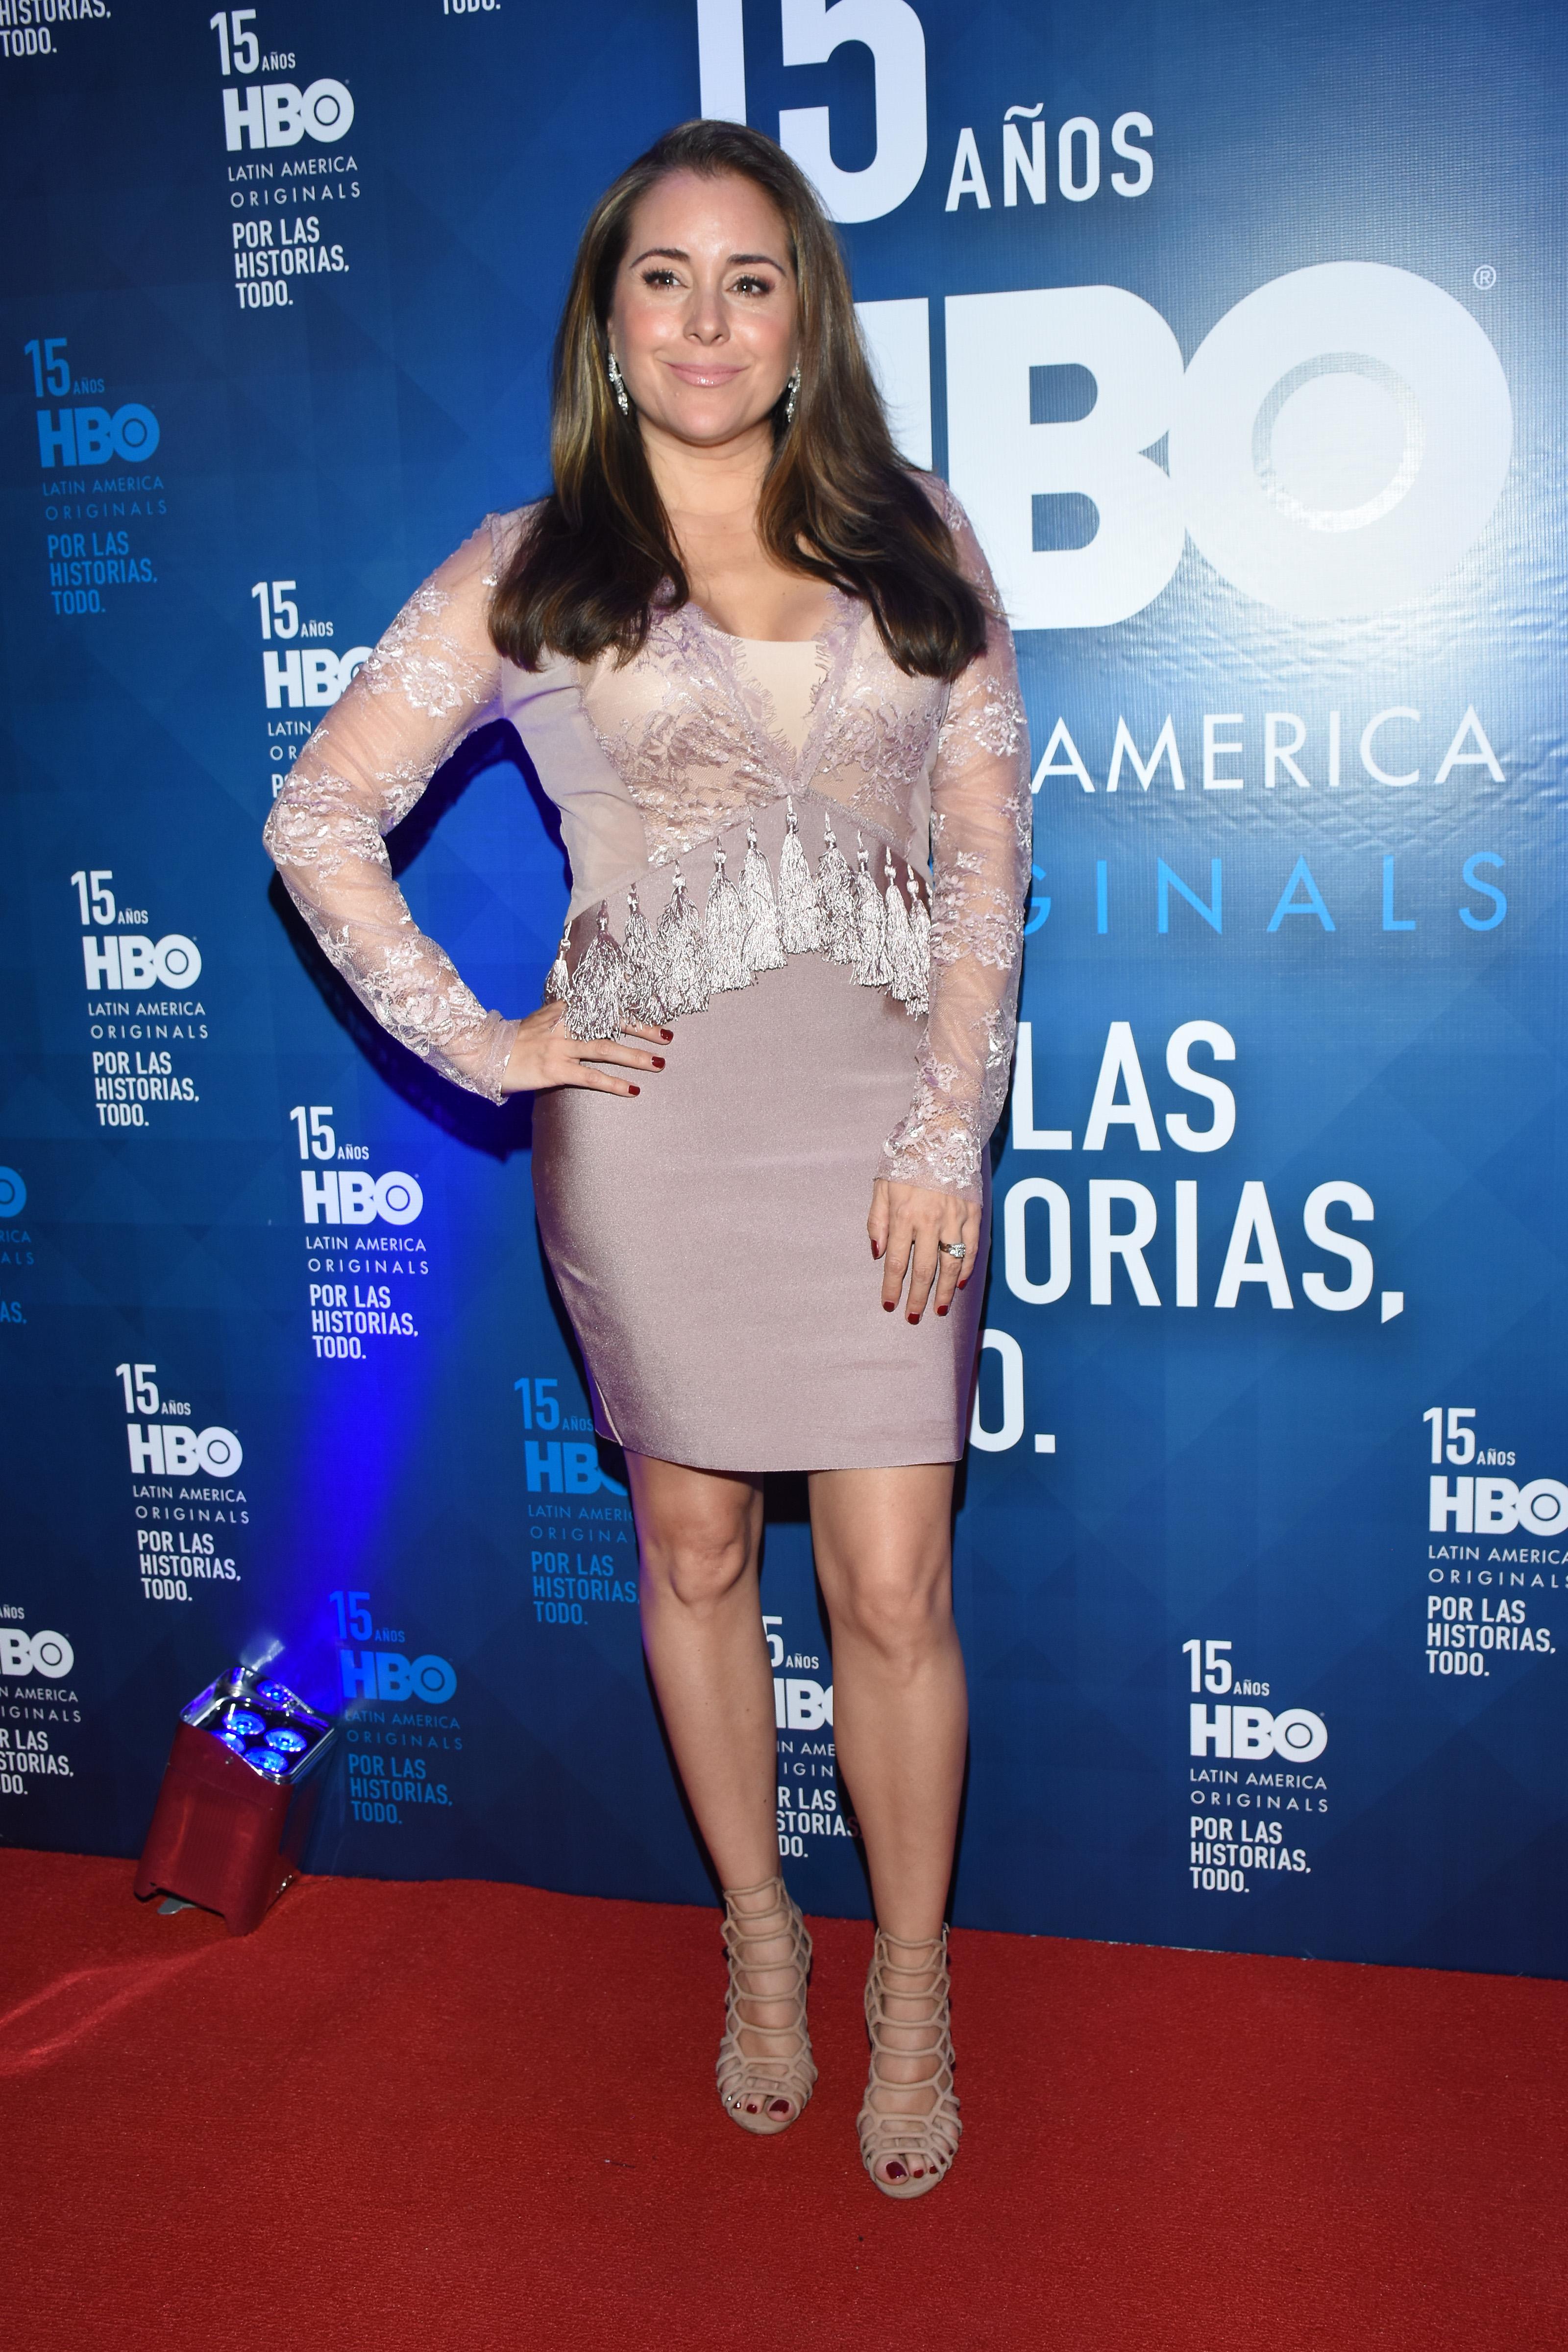 15th HBO Latin America Arrivals, Mexico City, Mexico - 18 Jul 2018